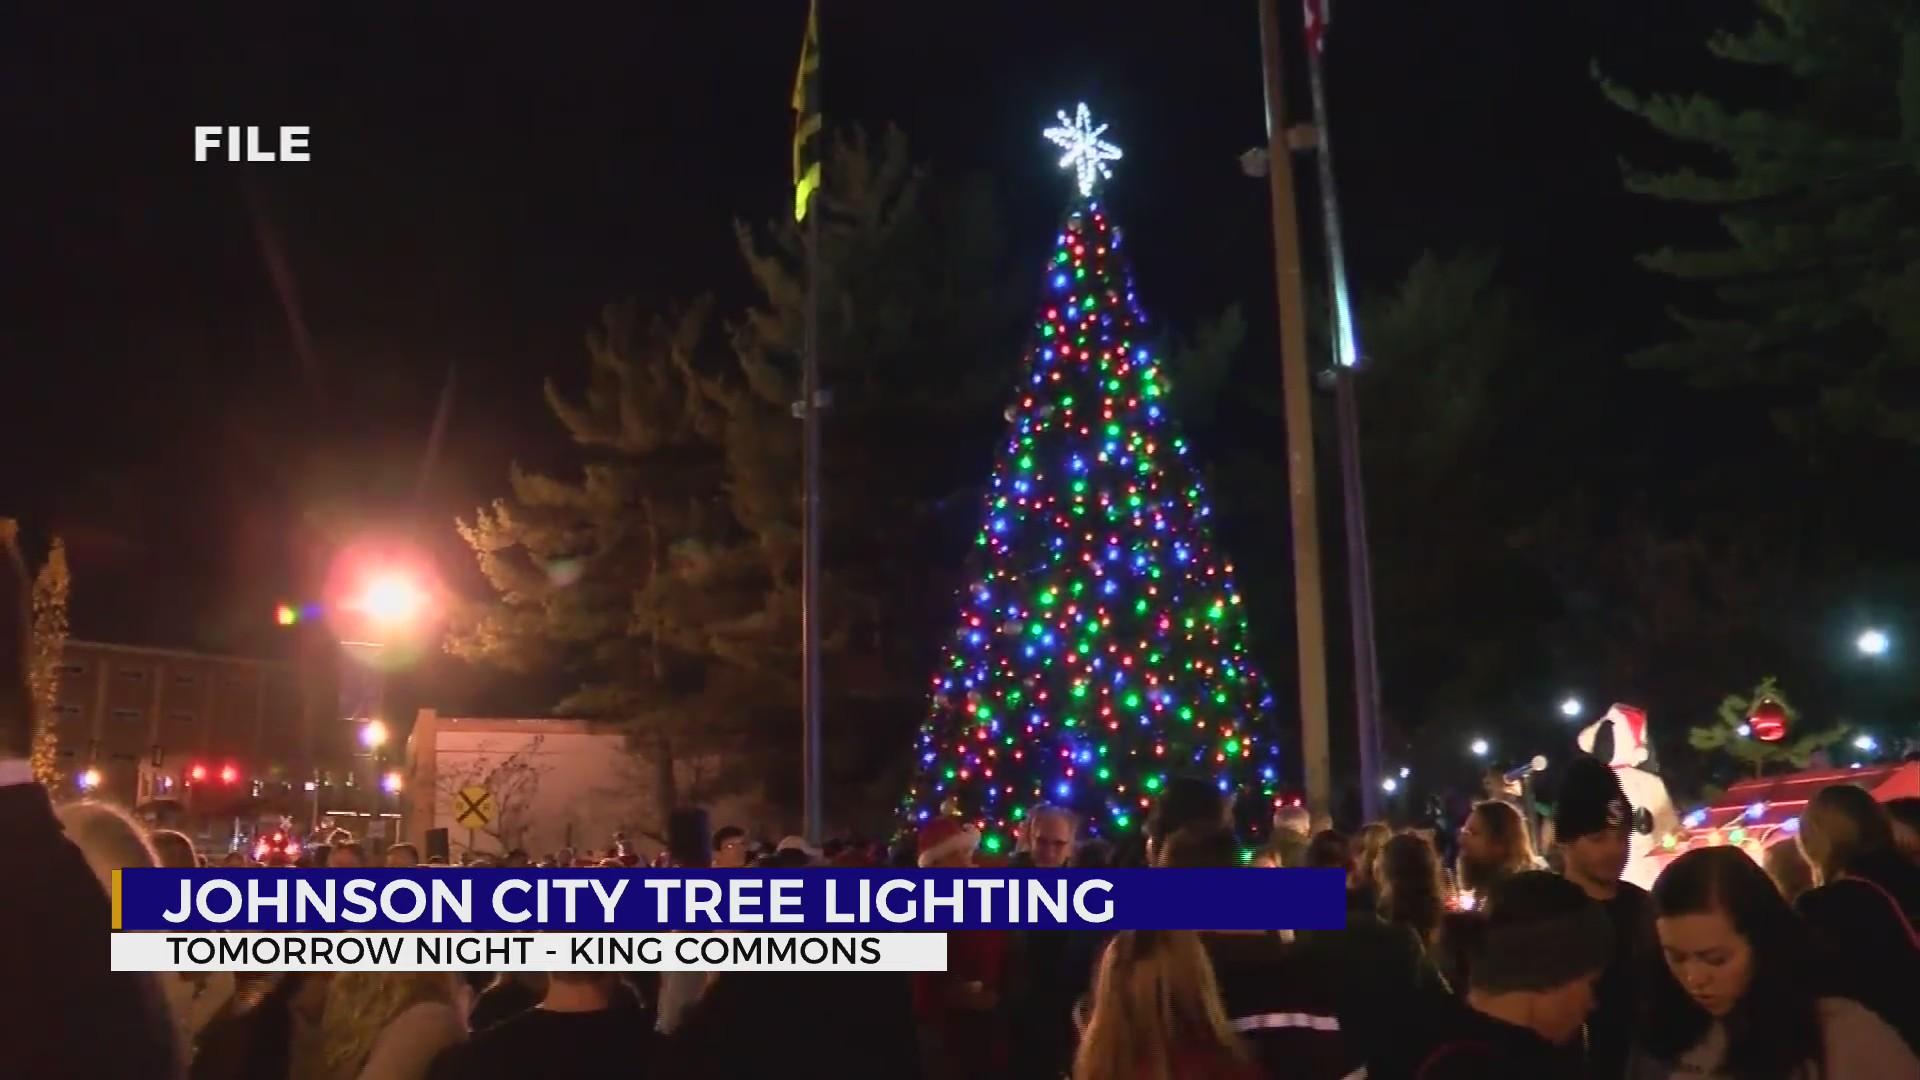 Tri Cities Tn Christmas Eve Events 2020 Johnson City prepares for downtown Christmas Tree Lighting Friday